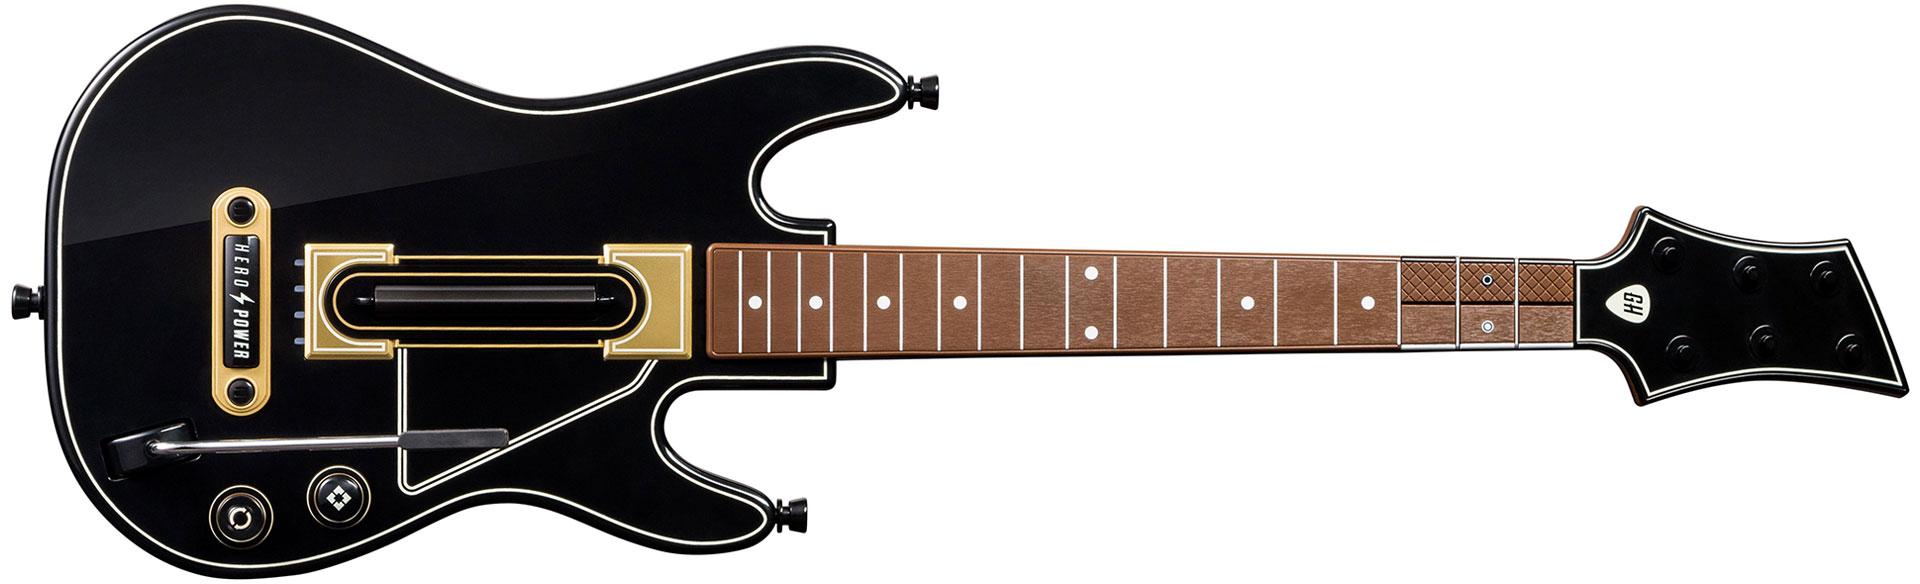 ghl_guitar_controller